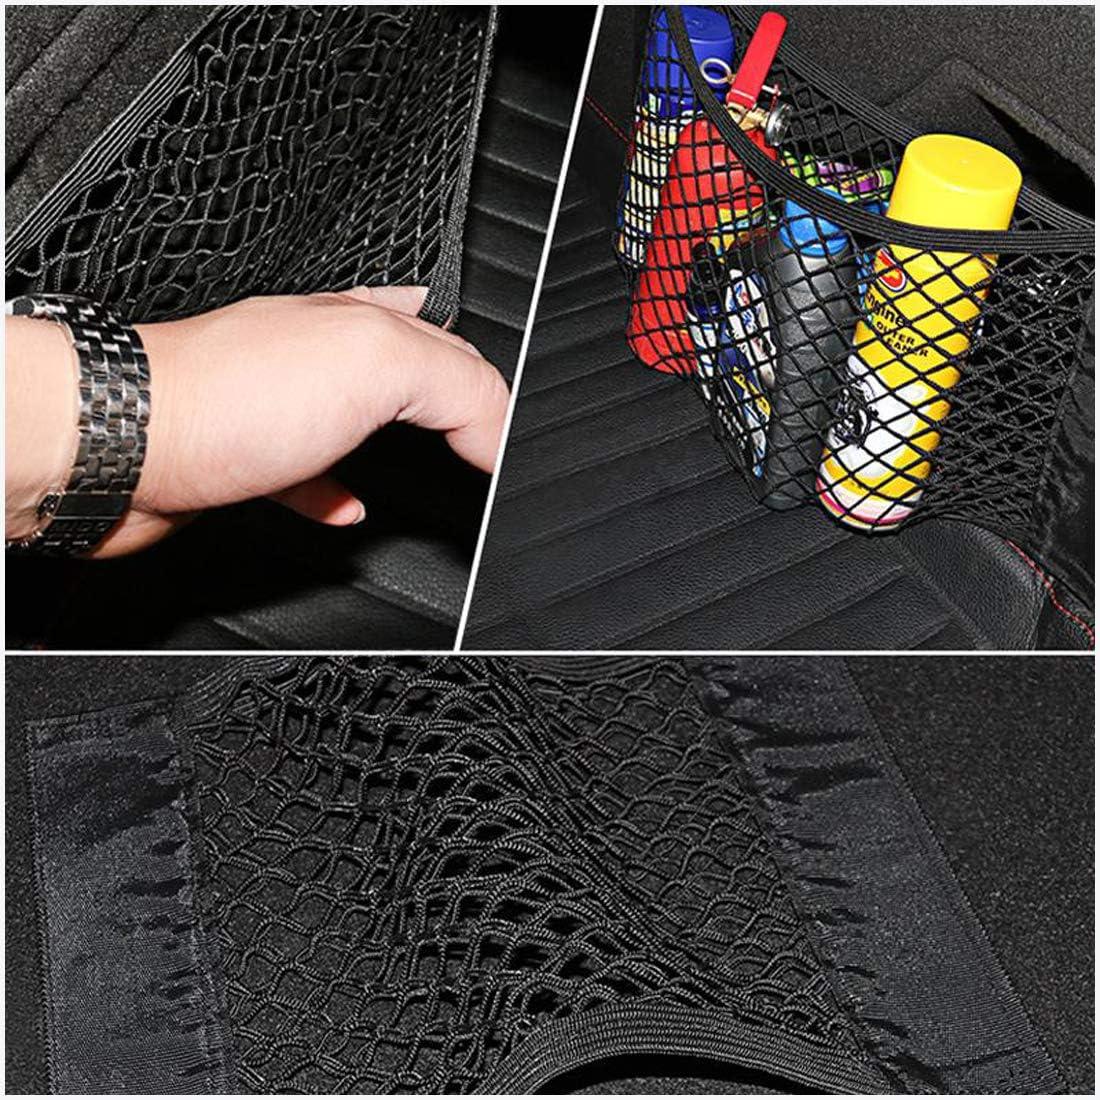 Bigbigjk 3 Pack Net Stretchable Universal Adjustable Elastic Truck Net with Hooks